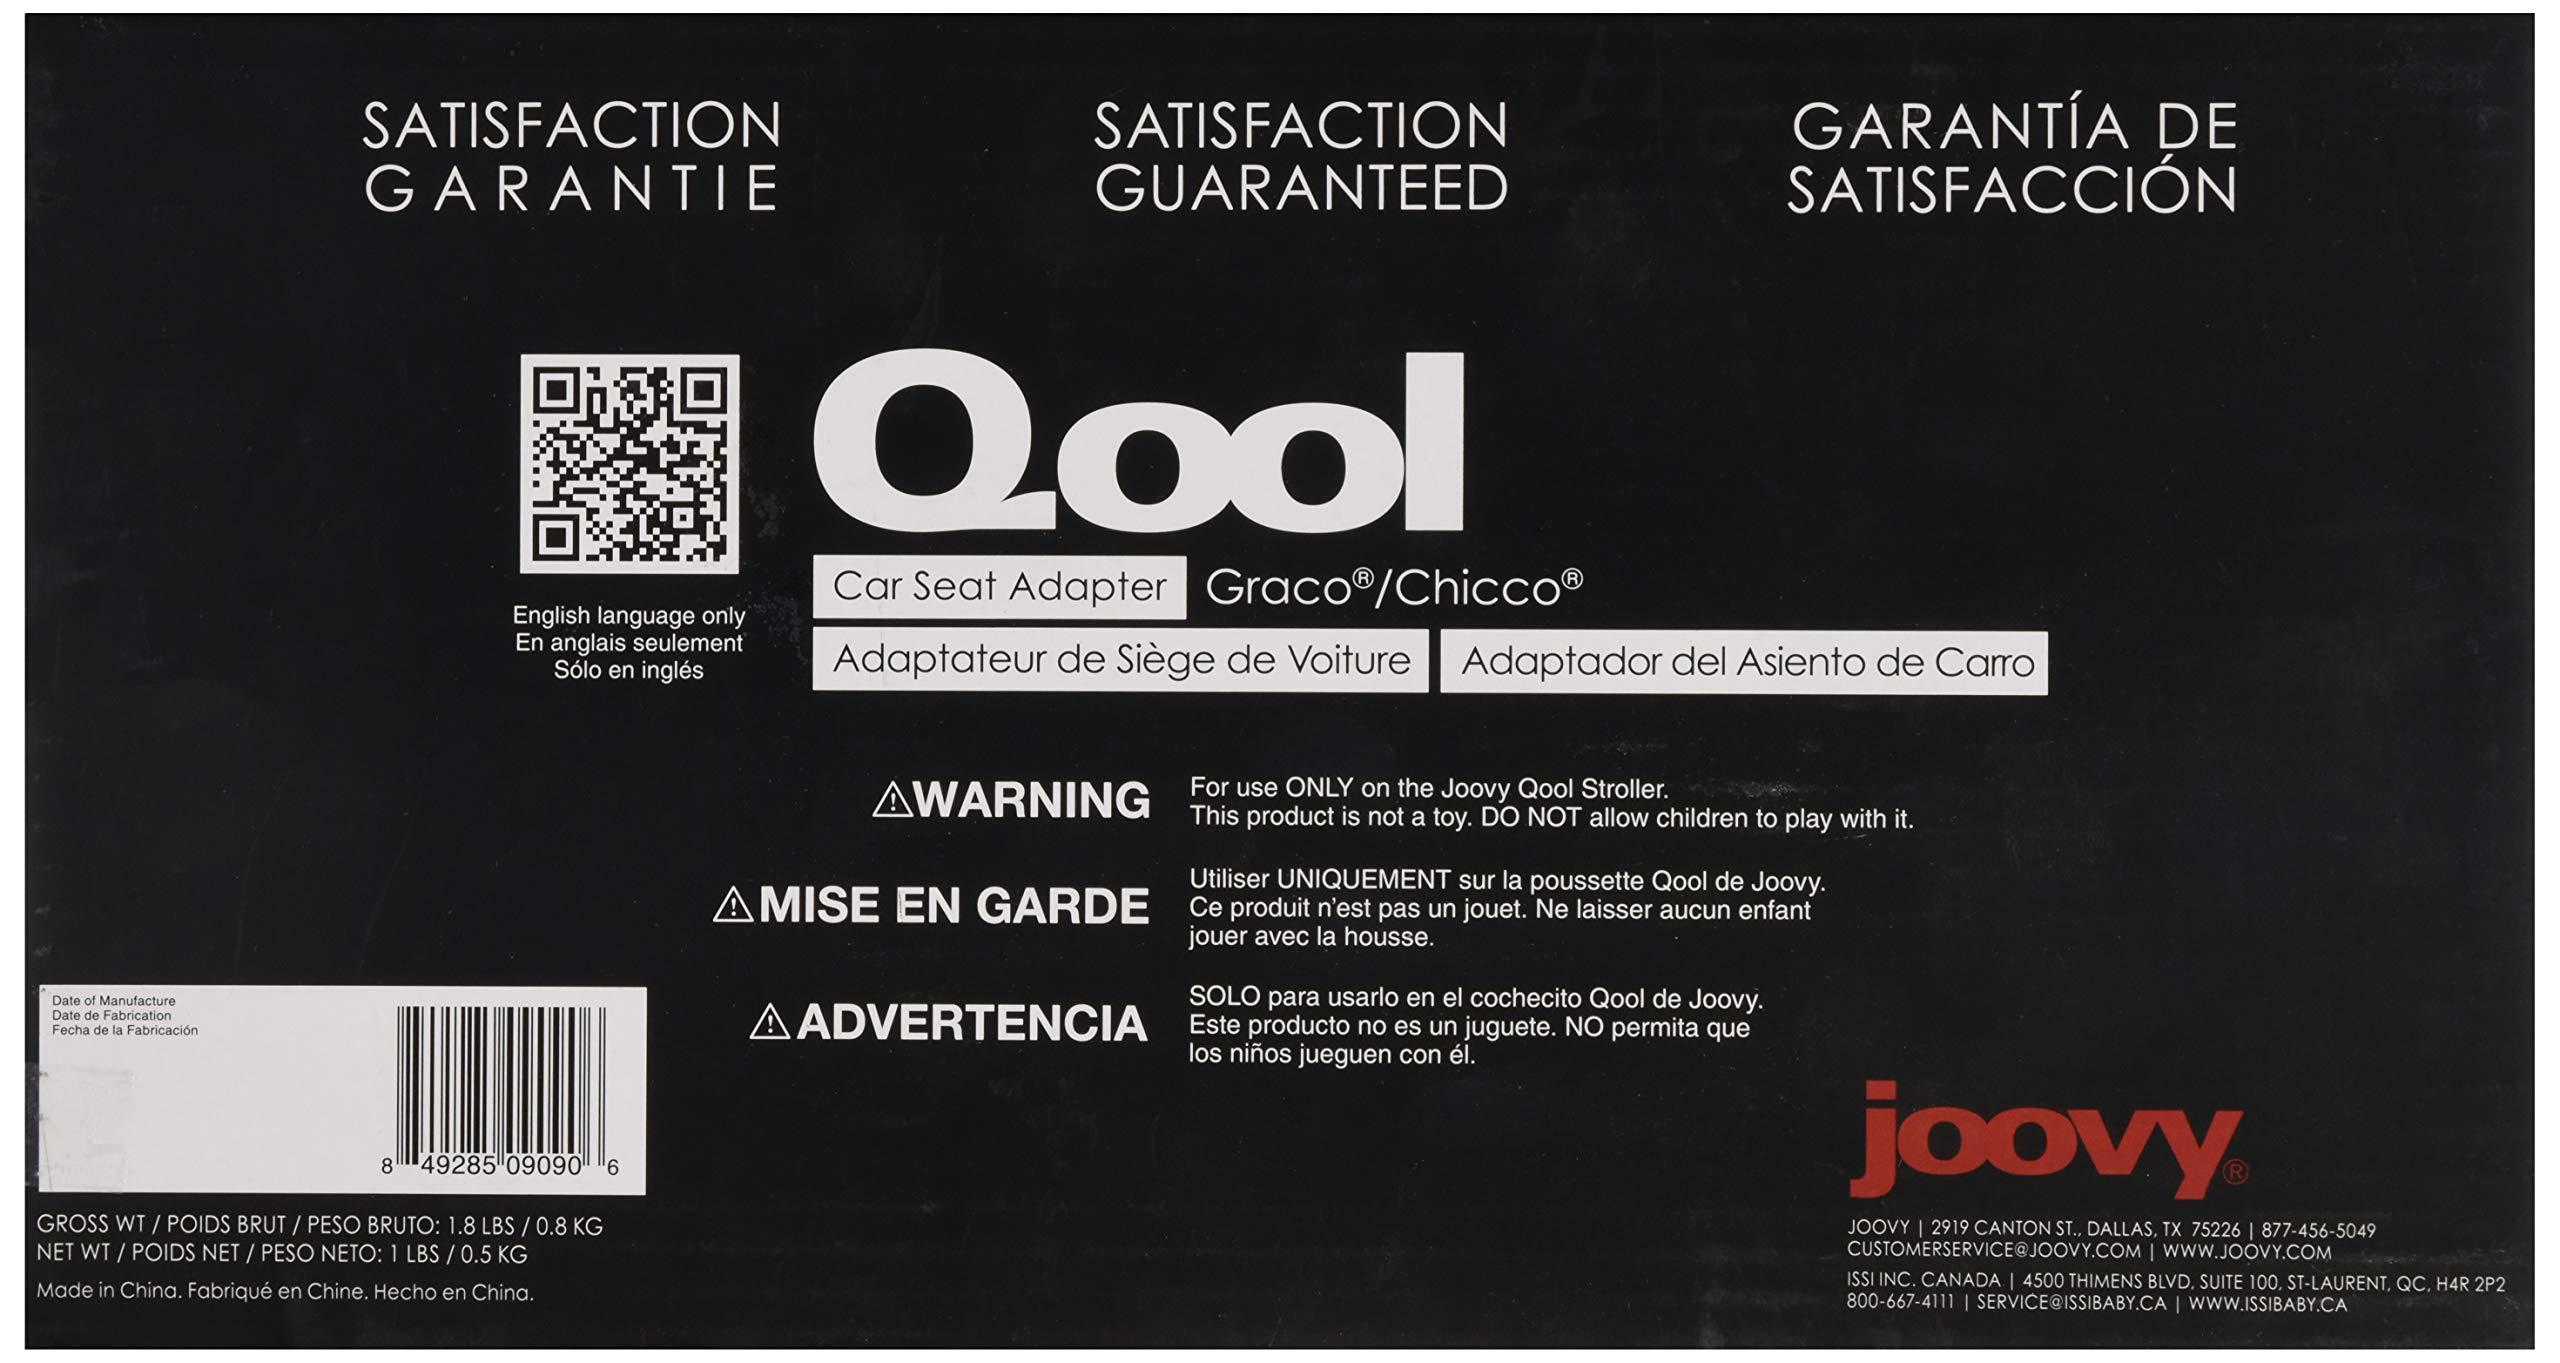 JOOVY Qool Car Seat Adapter, Graco/Chicco by Joovy (Image #3)